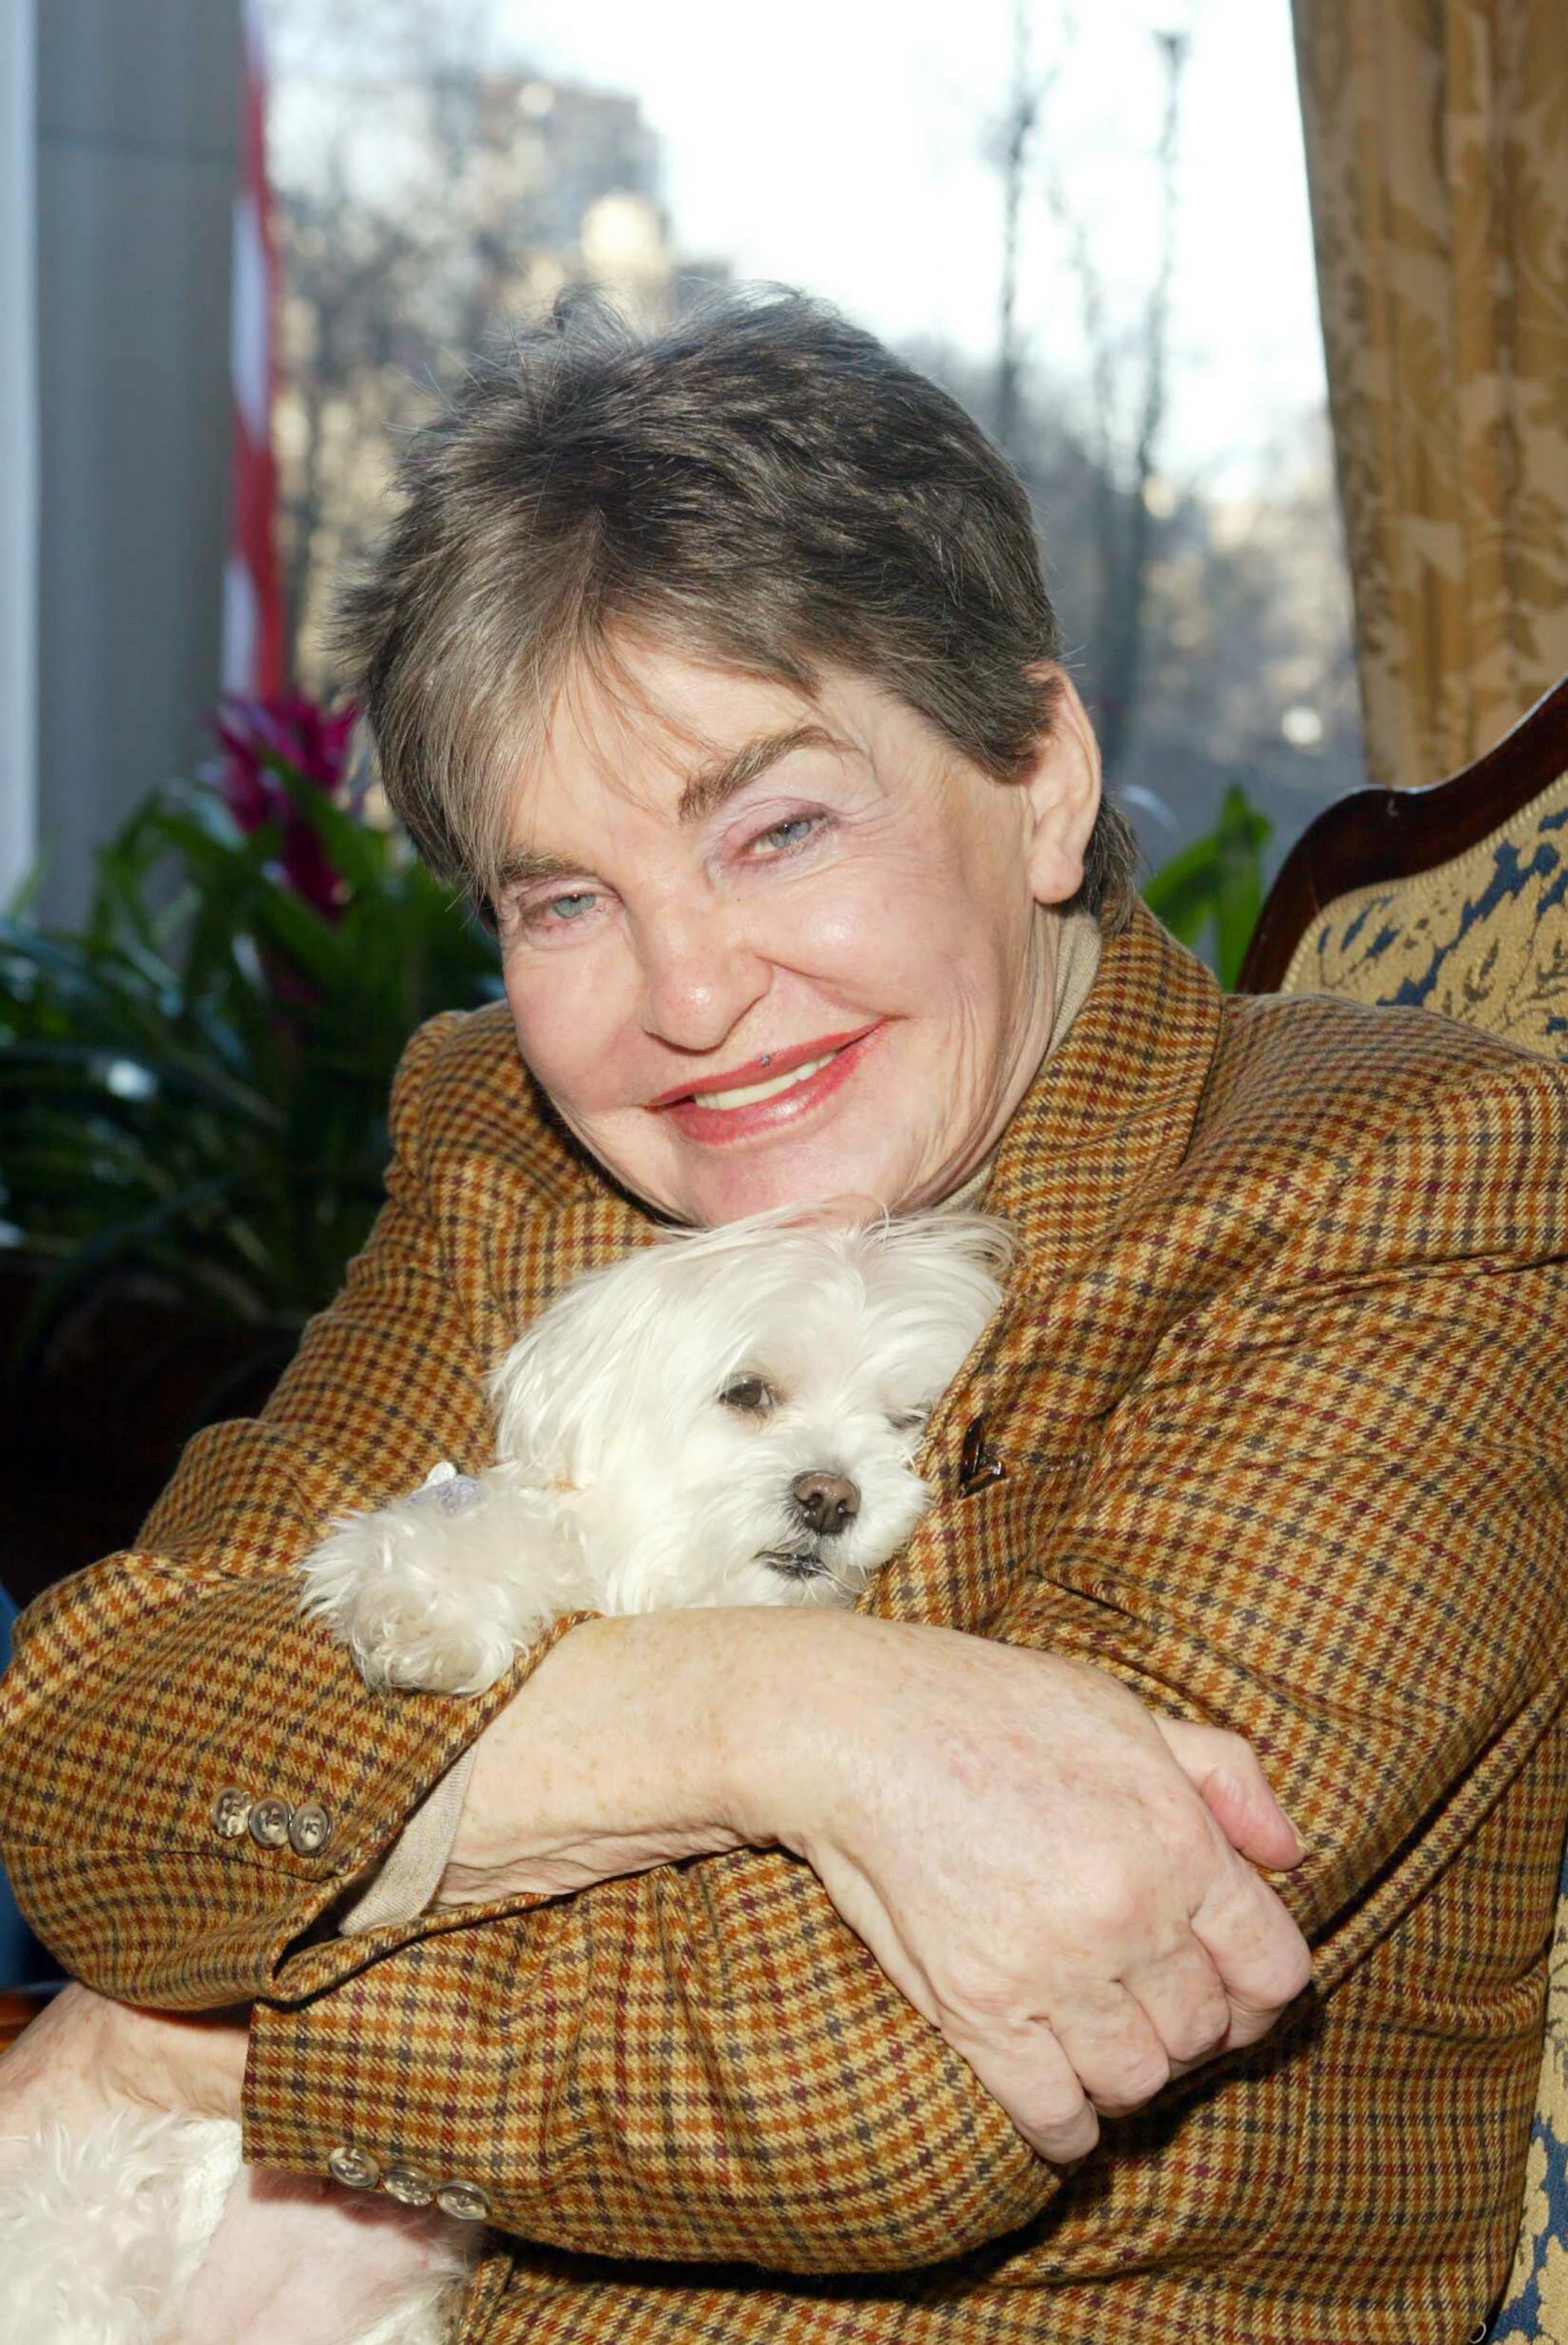 Leona Helmsleys $12 million dog, Trouble, July 16, 2008.